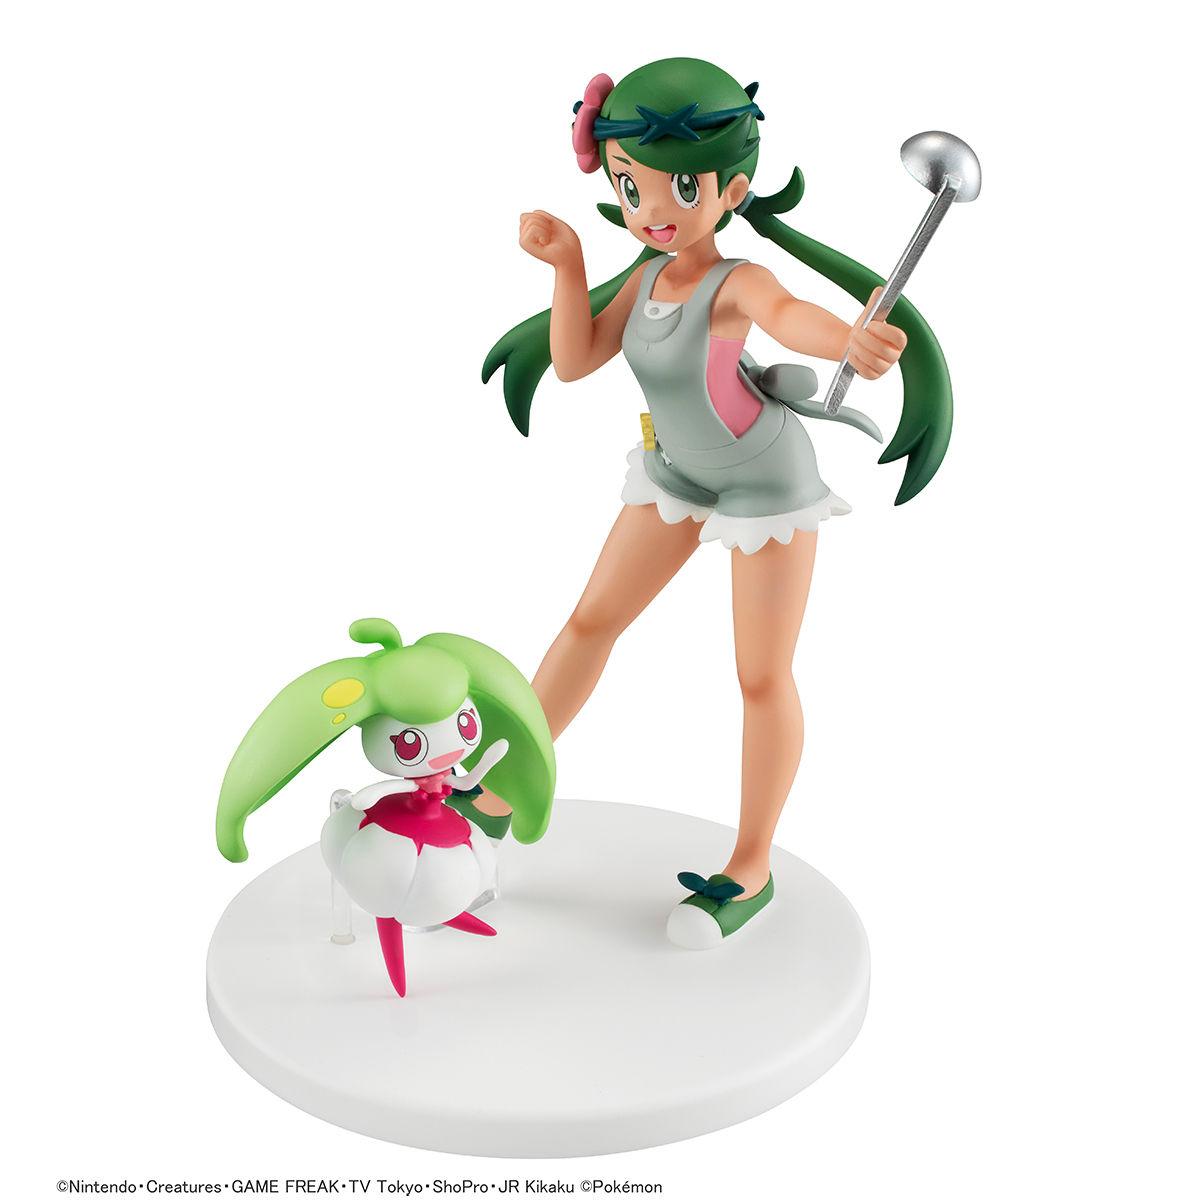 G.E.M.シリーズ『マオ&アママイコ』ポケットモンスター 完成品フィギュア-002